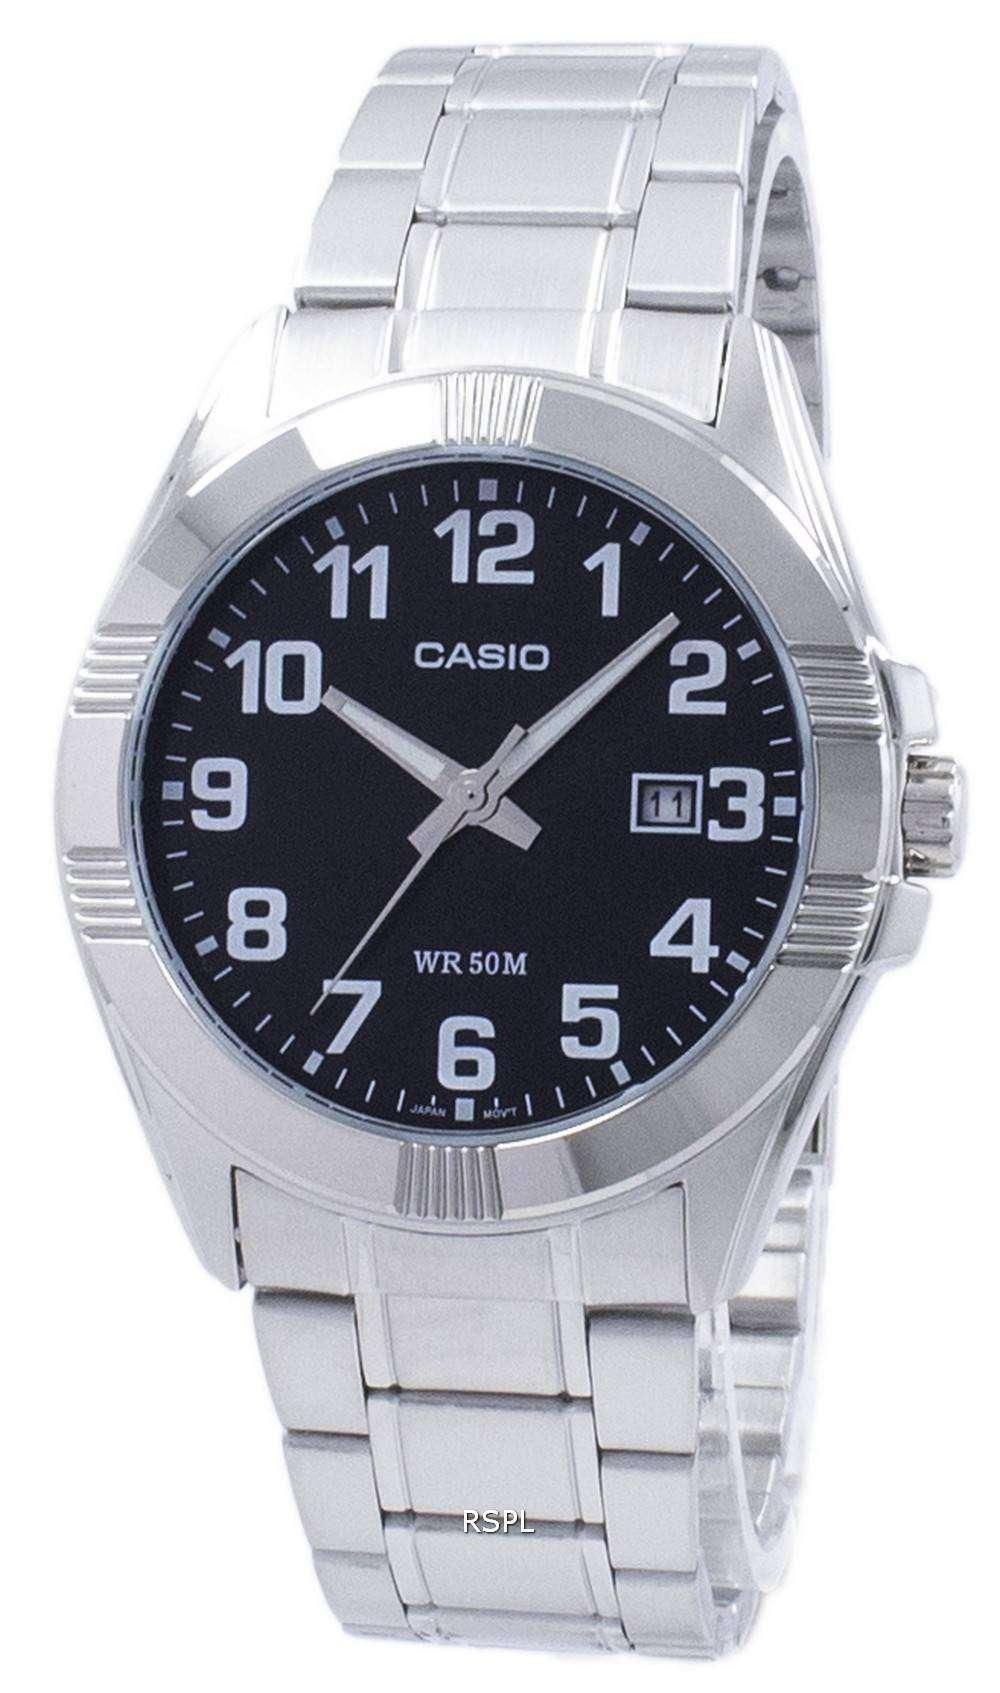 1bv De Analógico Casio Men 1308 D Mtp Cuarzo Mtp1308d Reloj I2HDWE9